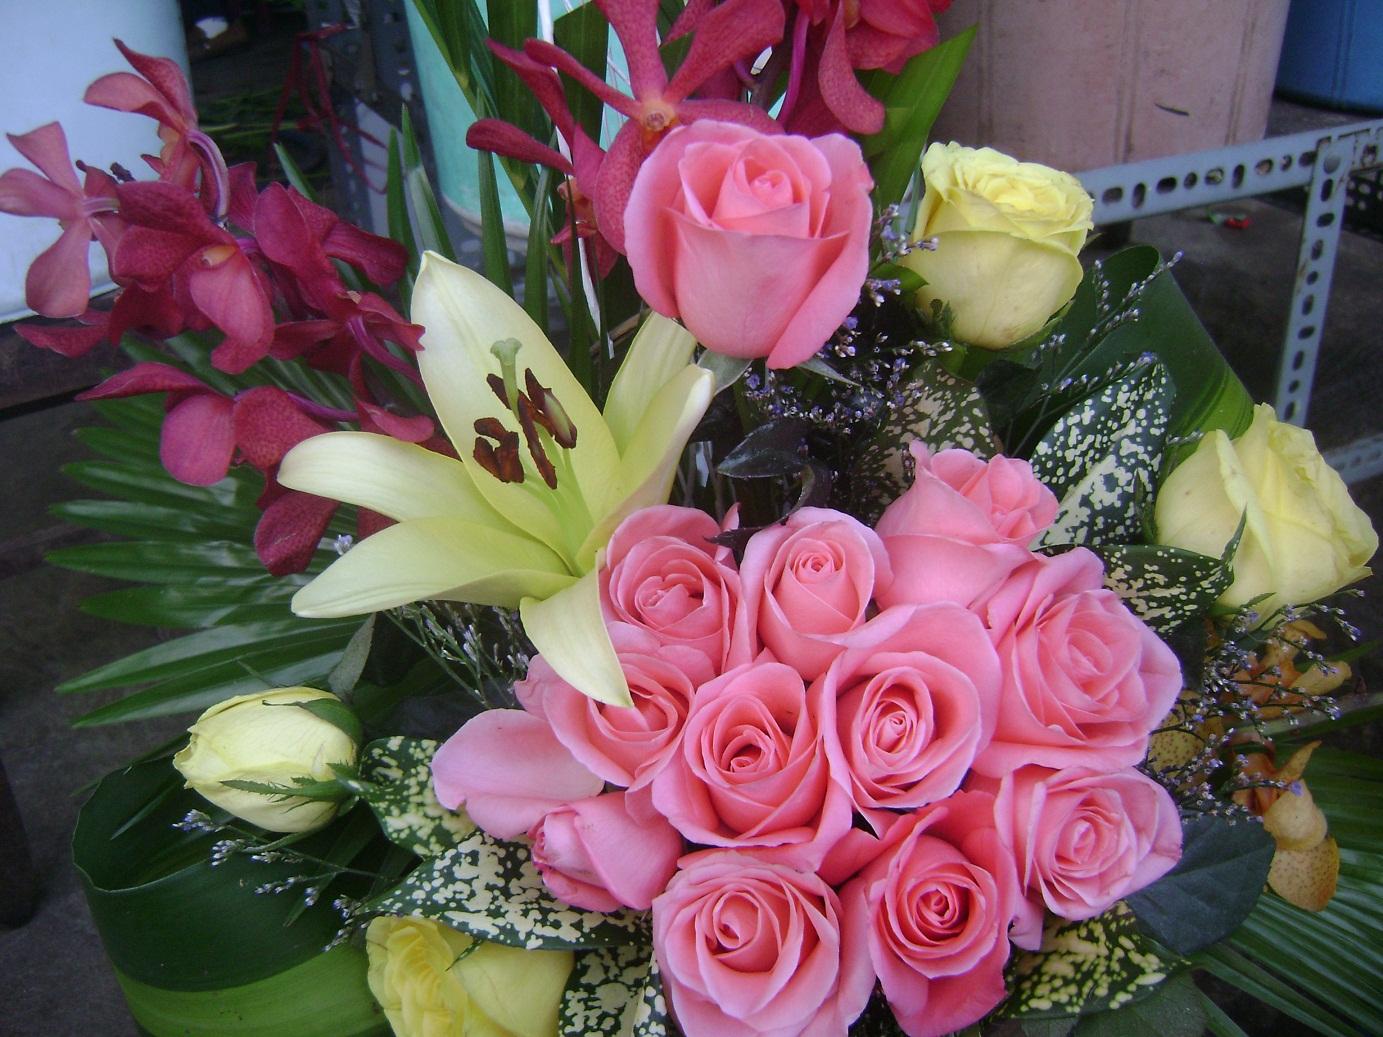 hinh nen hoa